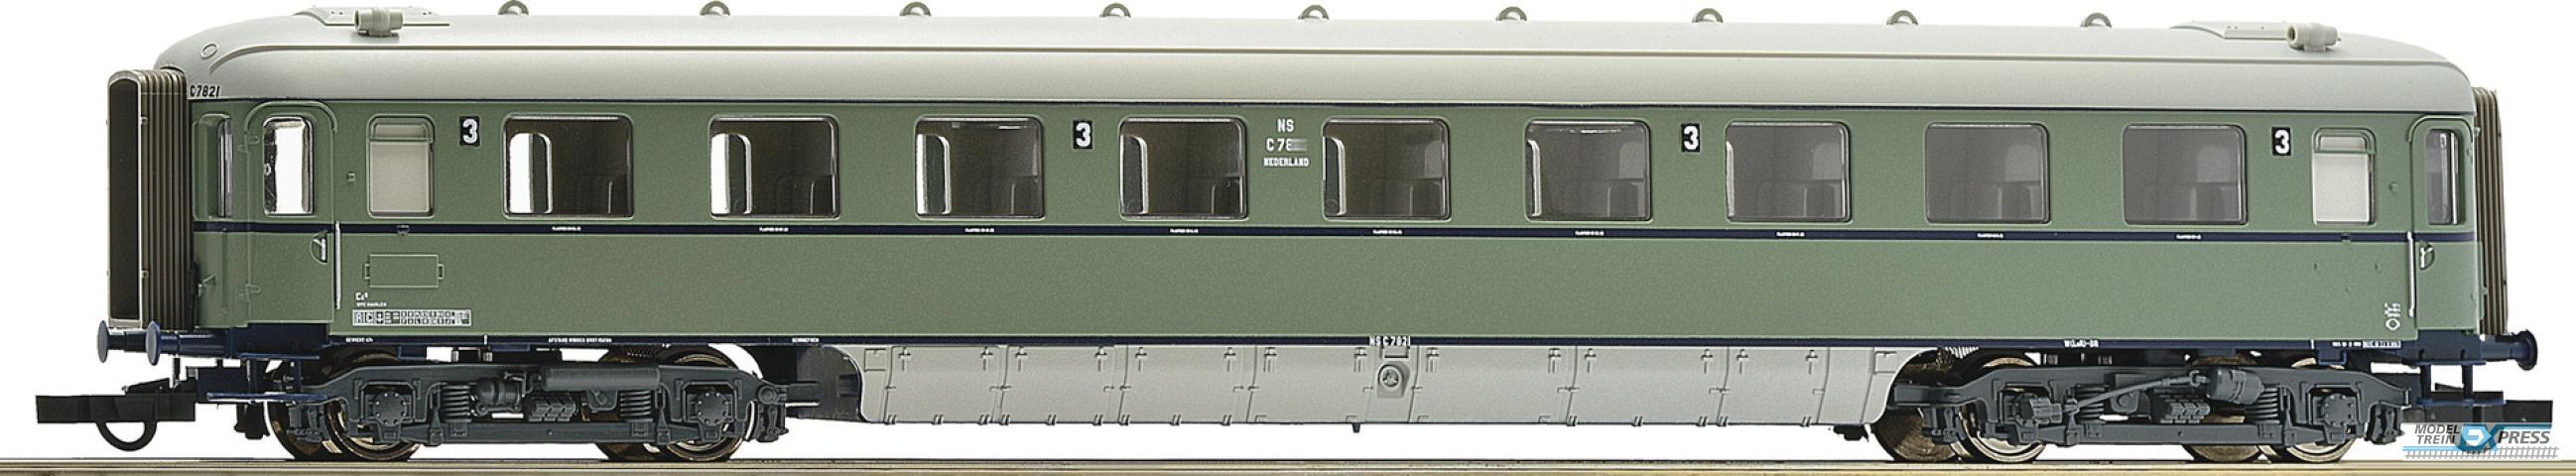 Roco 64997.1